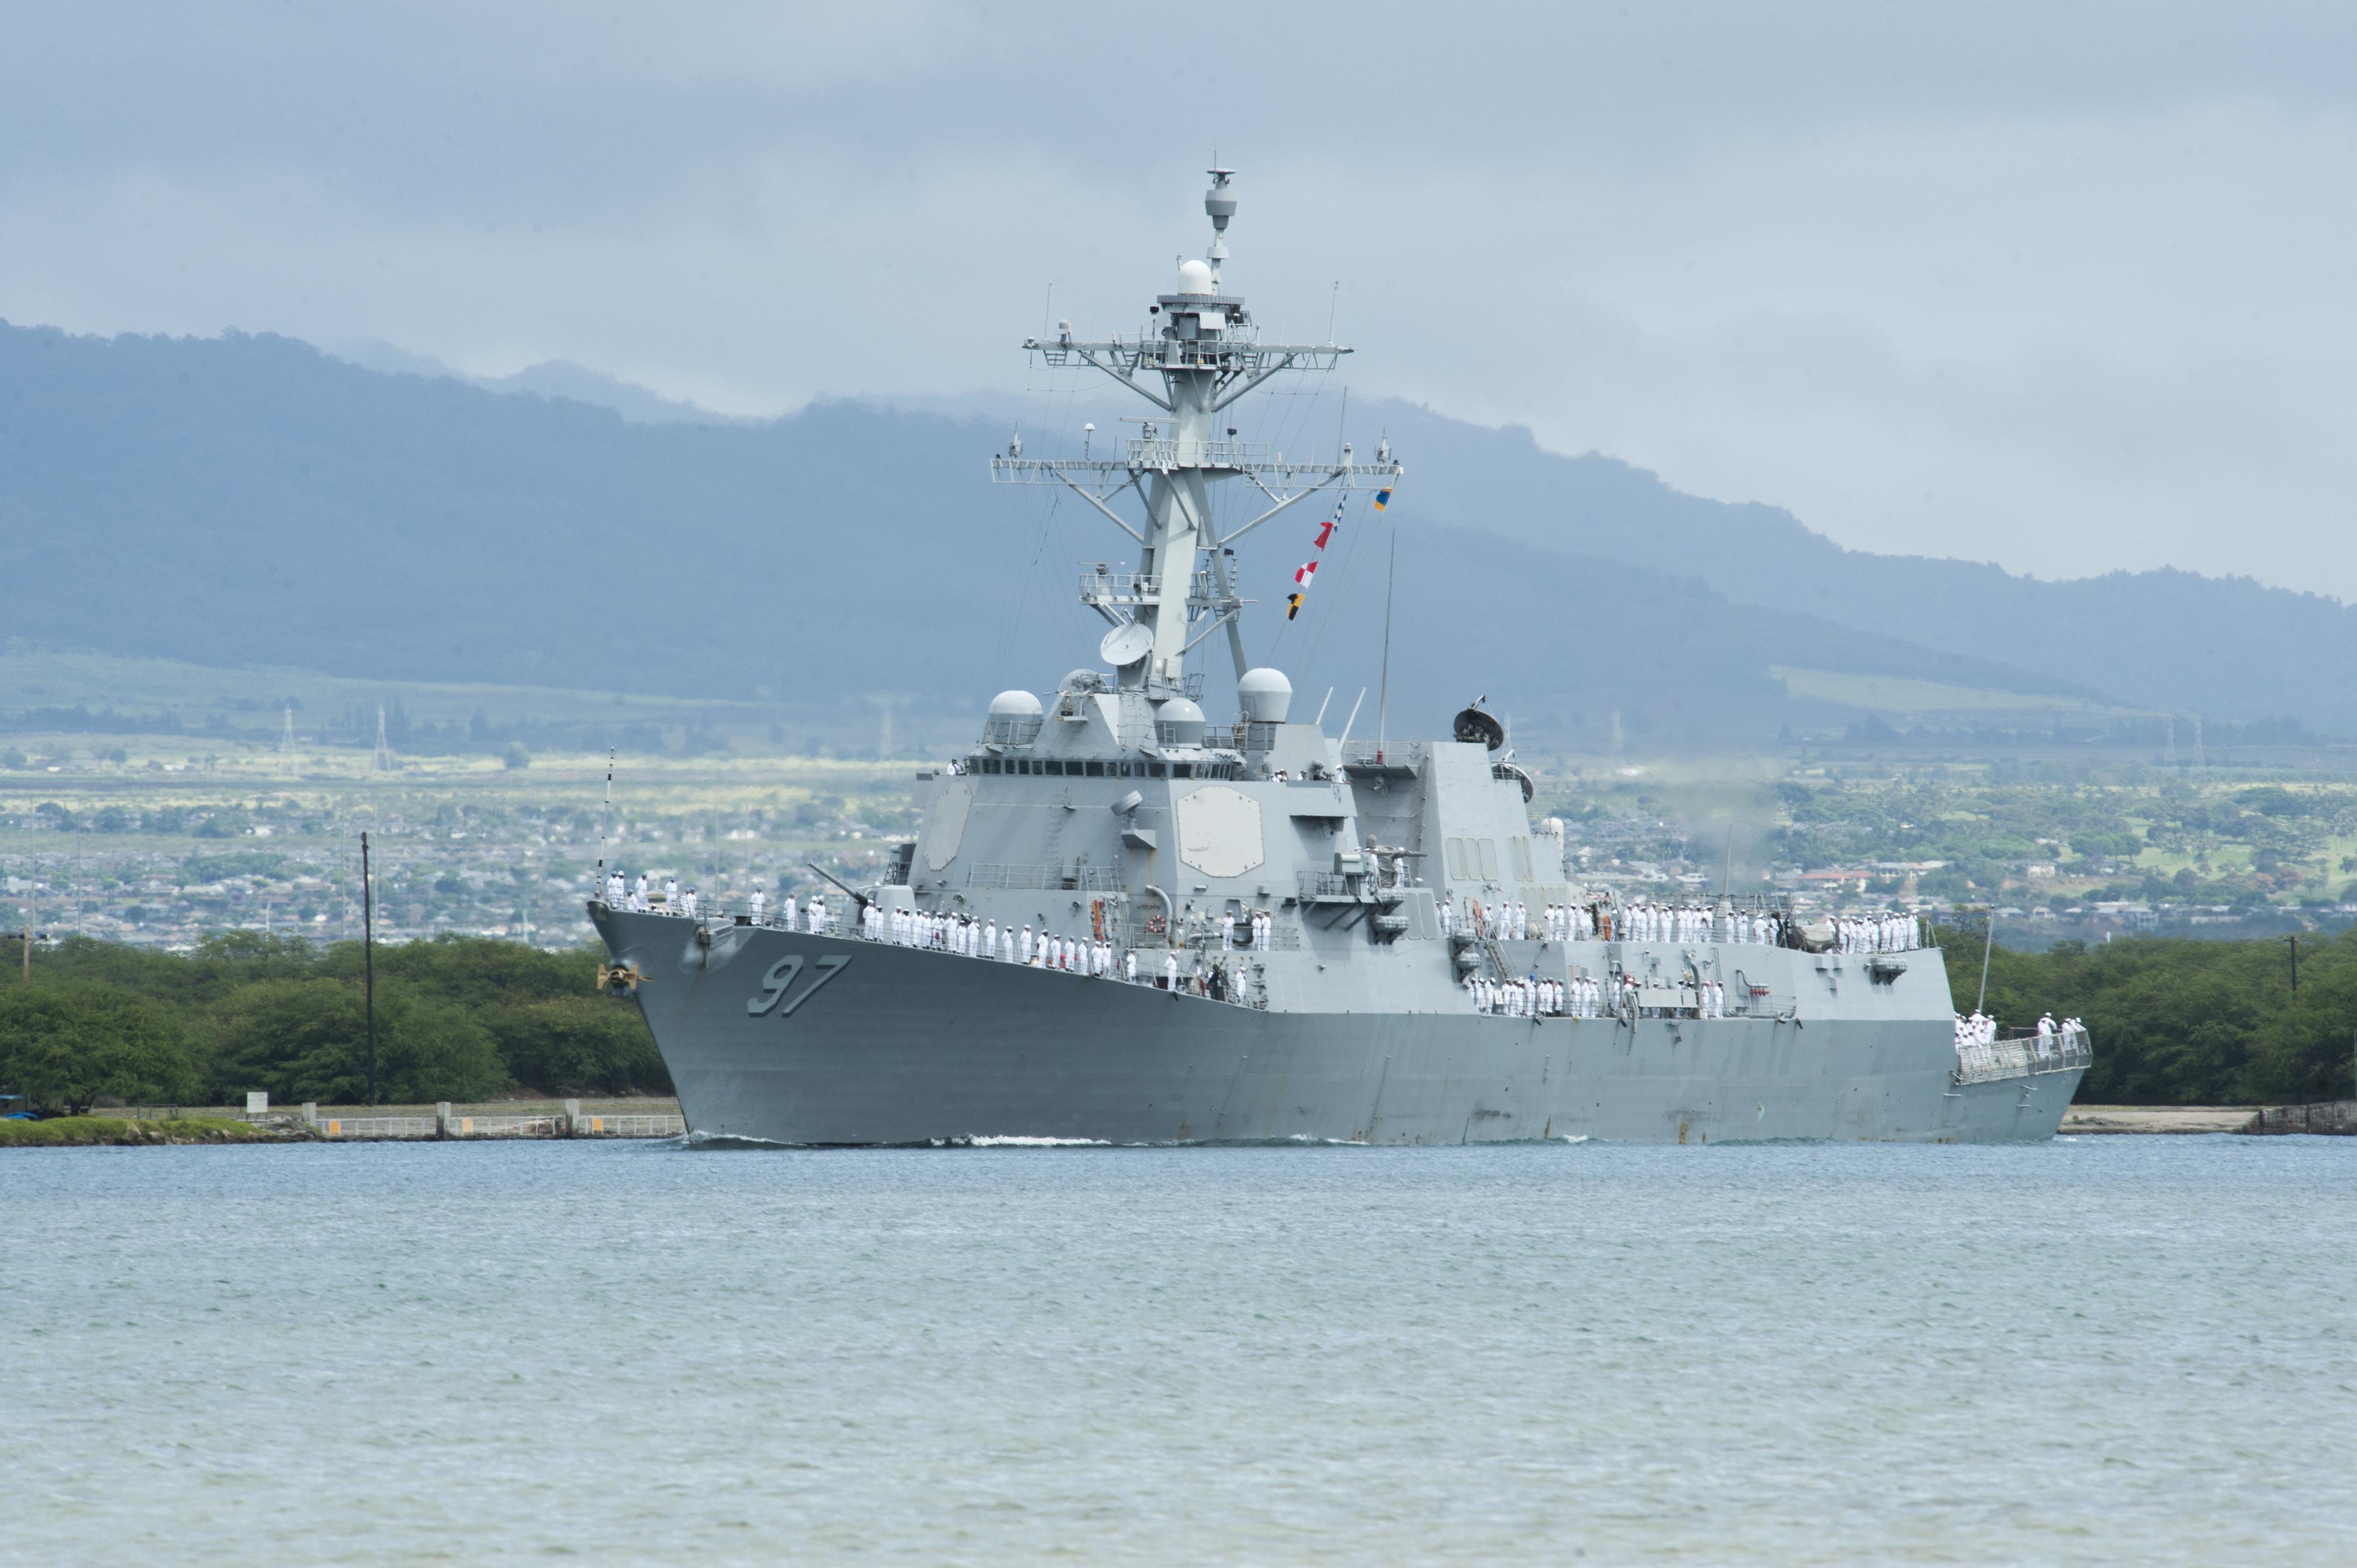 USS HALSEY DDG-97 Auslaufen Pearl Harbor am 07.07.2014 Bild: U.S. Navy